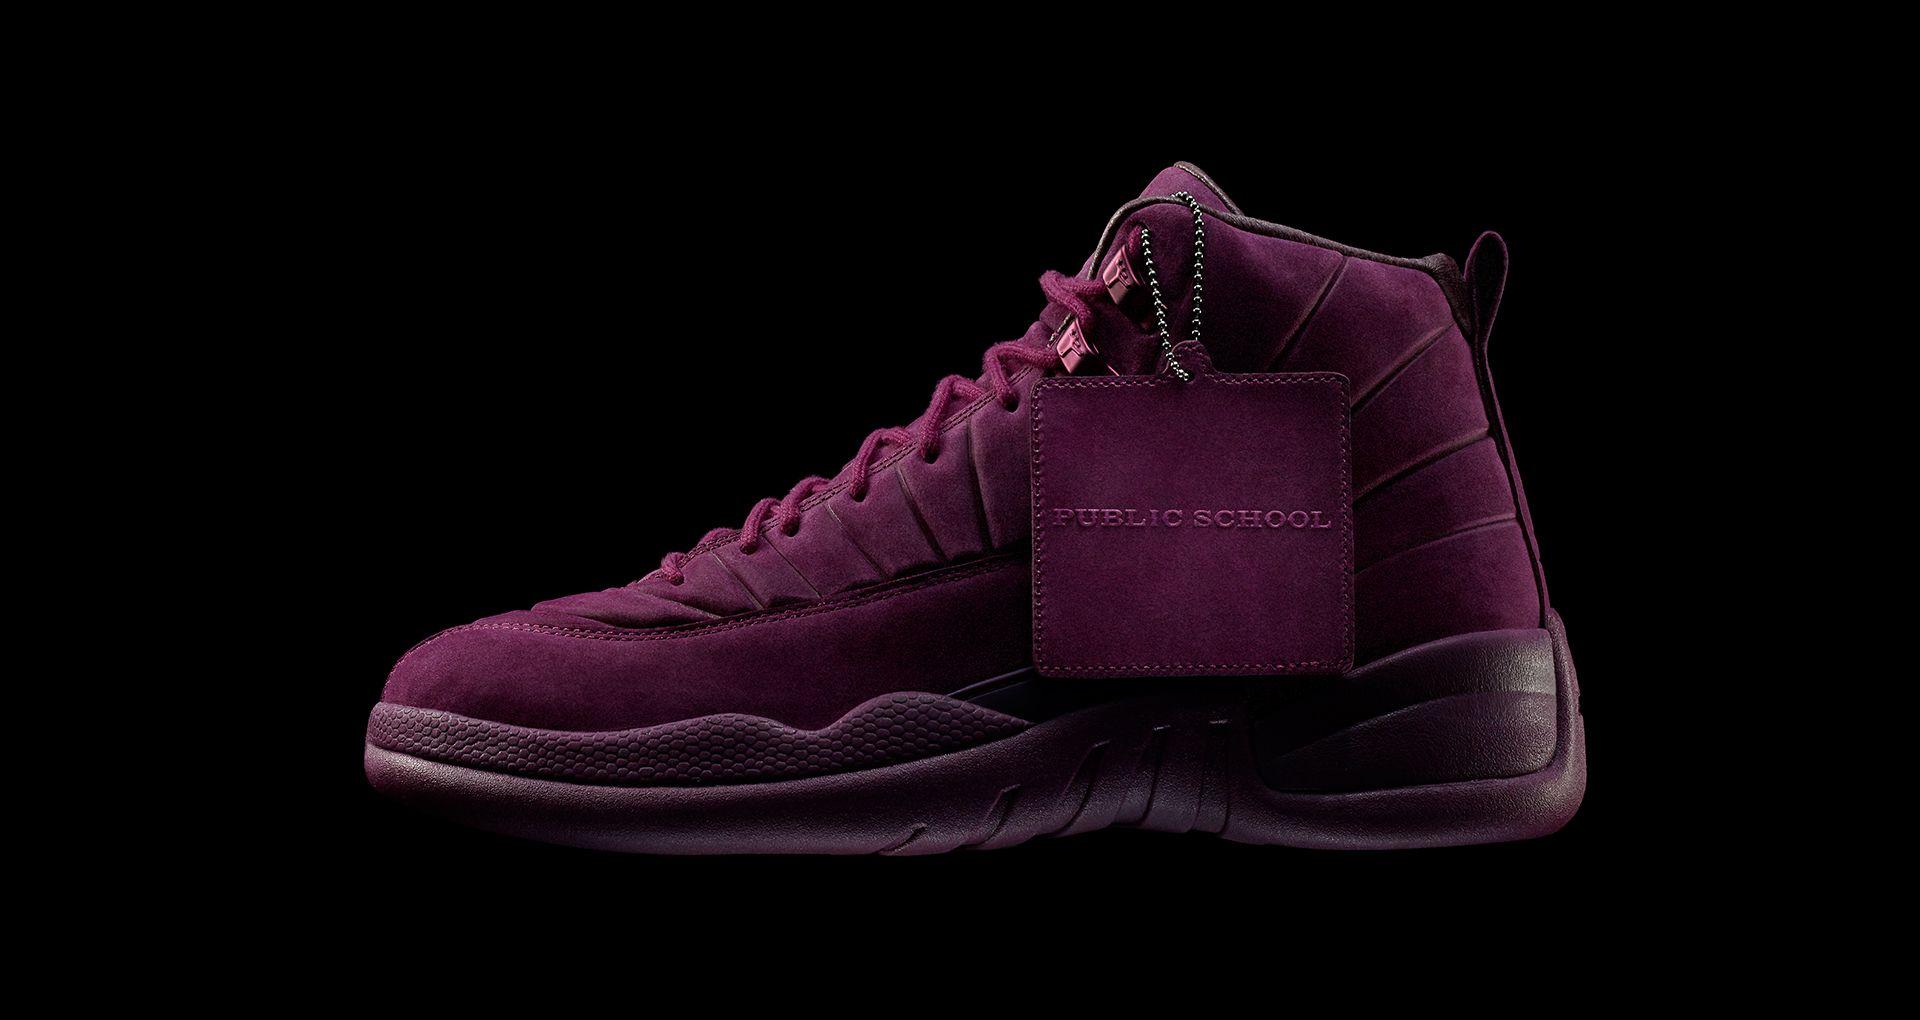 size 40 4f949 badc7 Air Jordan 12 Retro PSNY  Bordeaux  Release Date. Nike+ Launch GB